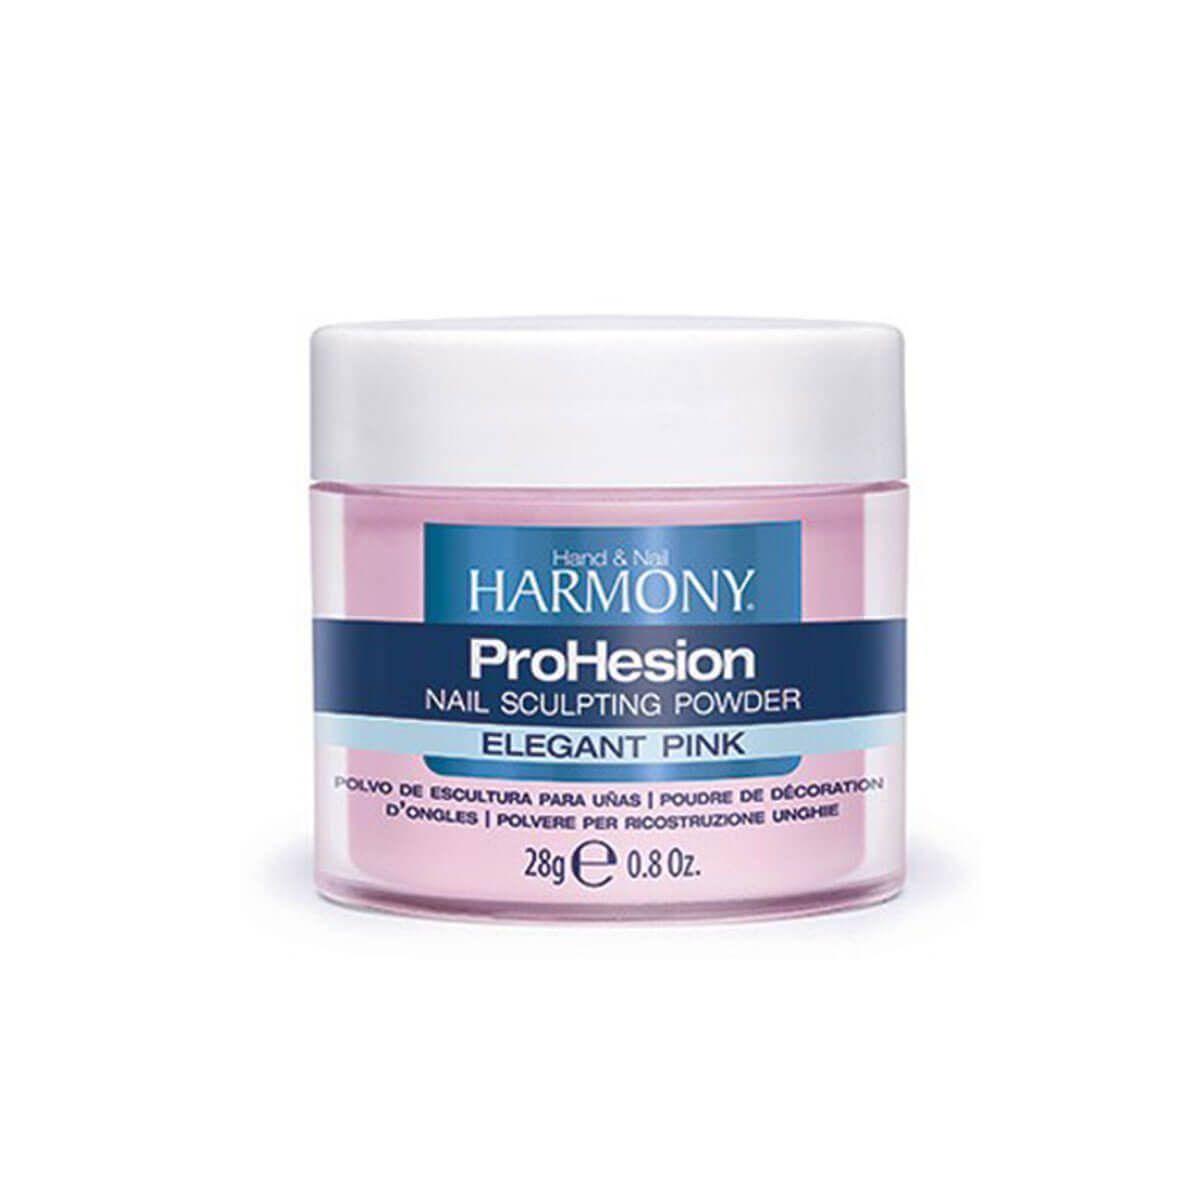 Pó Acrílico Harmony ProHesion Elegant Pink 28g